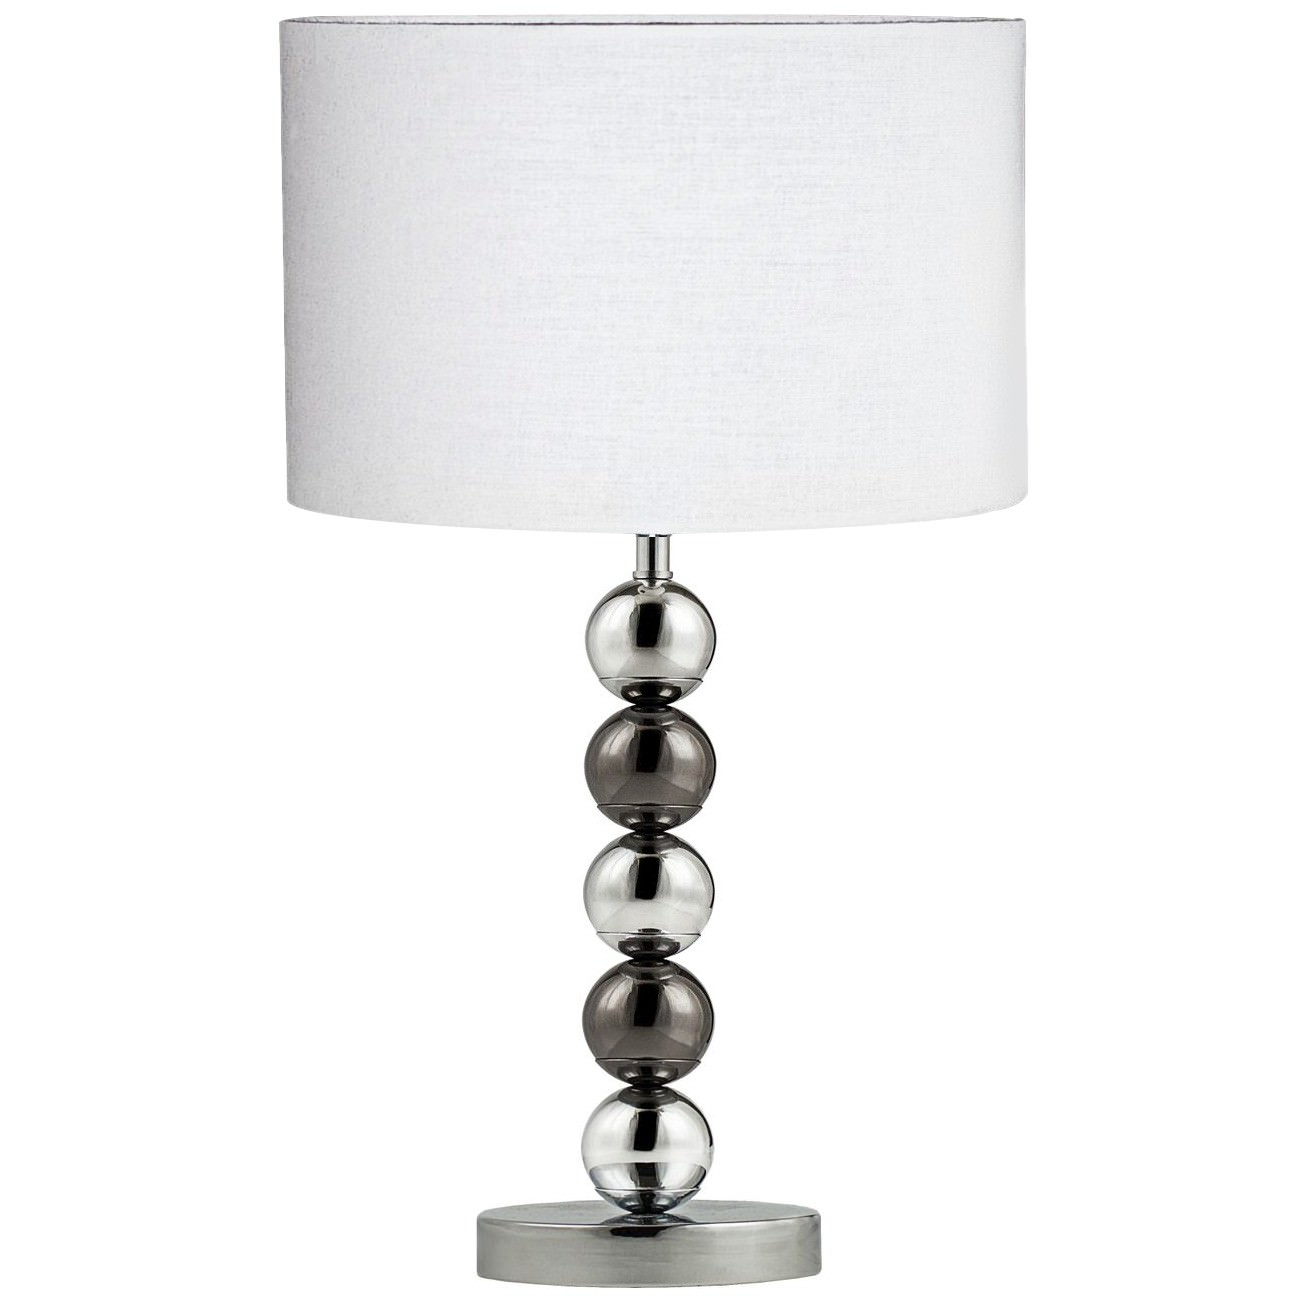 Maxi Marrisa Metal Base Table Lamp, White